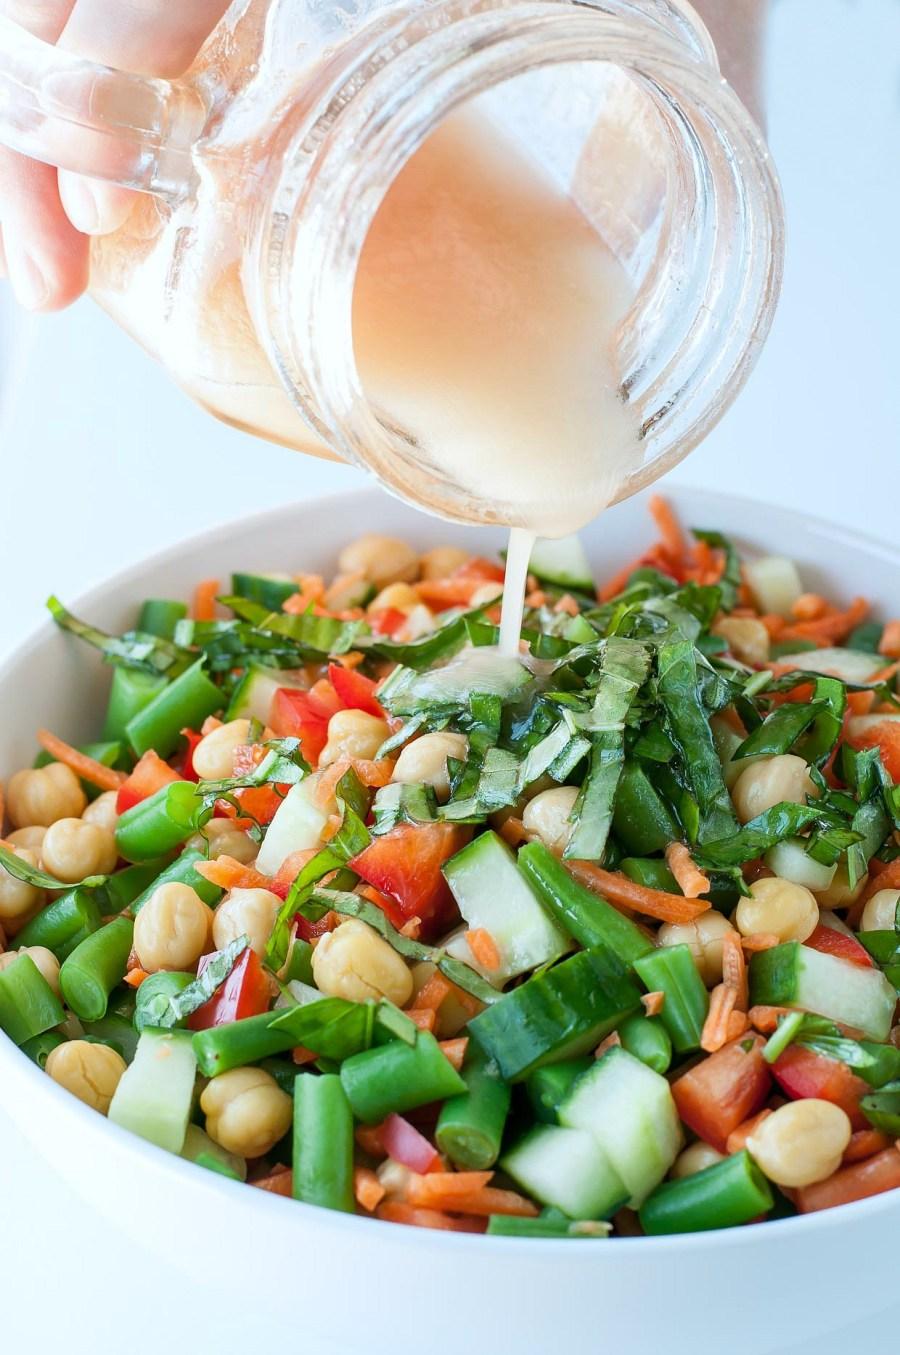 Chickpea Salad with Basil Vinaigrette Dressing